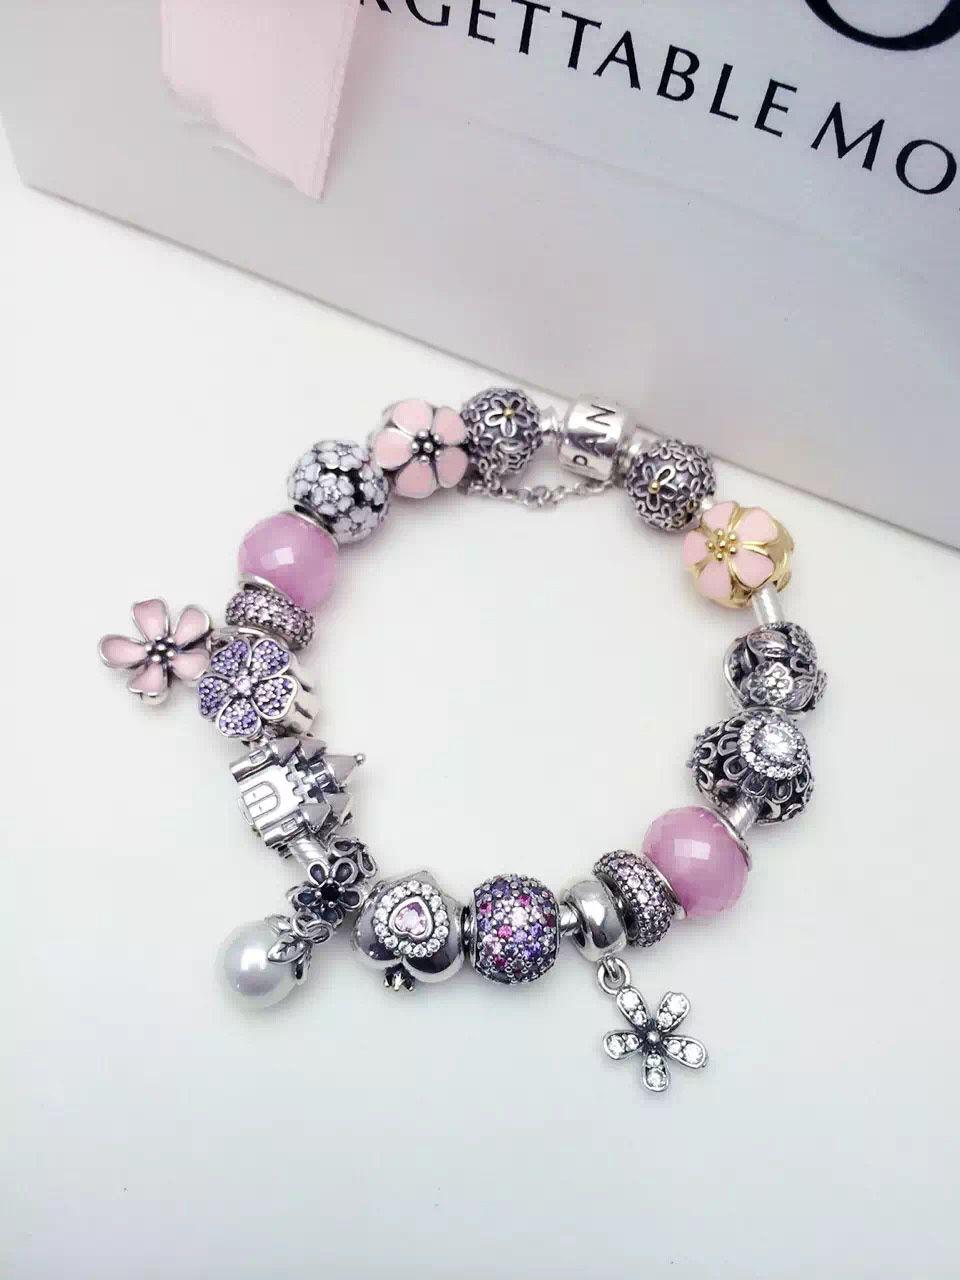 50 Off 399 Pandora Charm Bracelet Pink White Purple Hot Sale Sku Cb01657 Pandora Bracelet Ideas Acessorios Joias